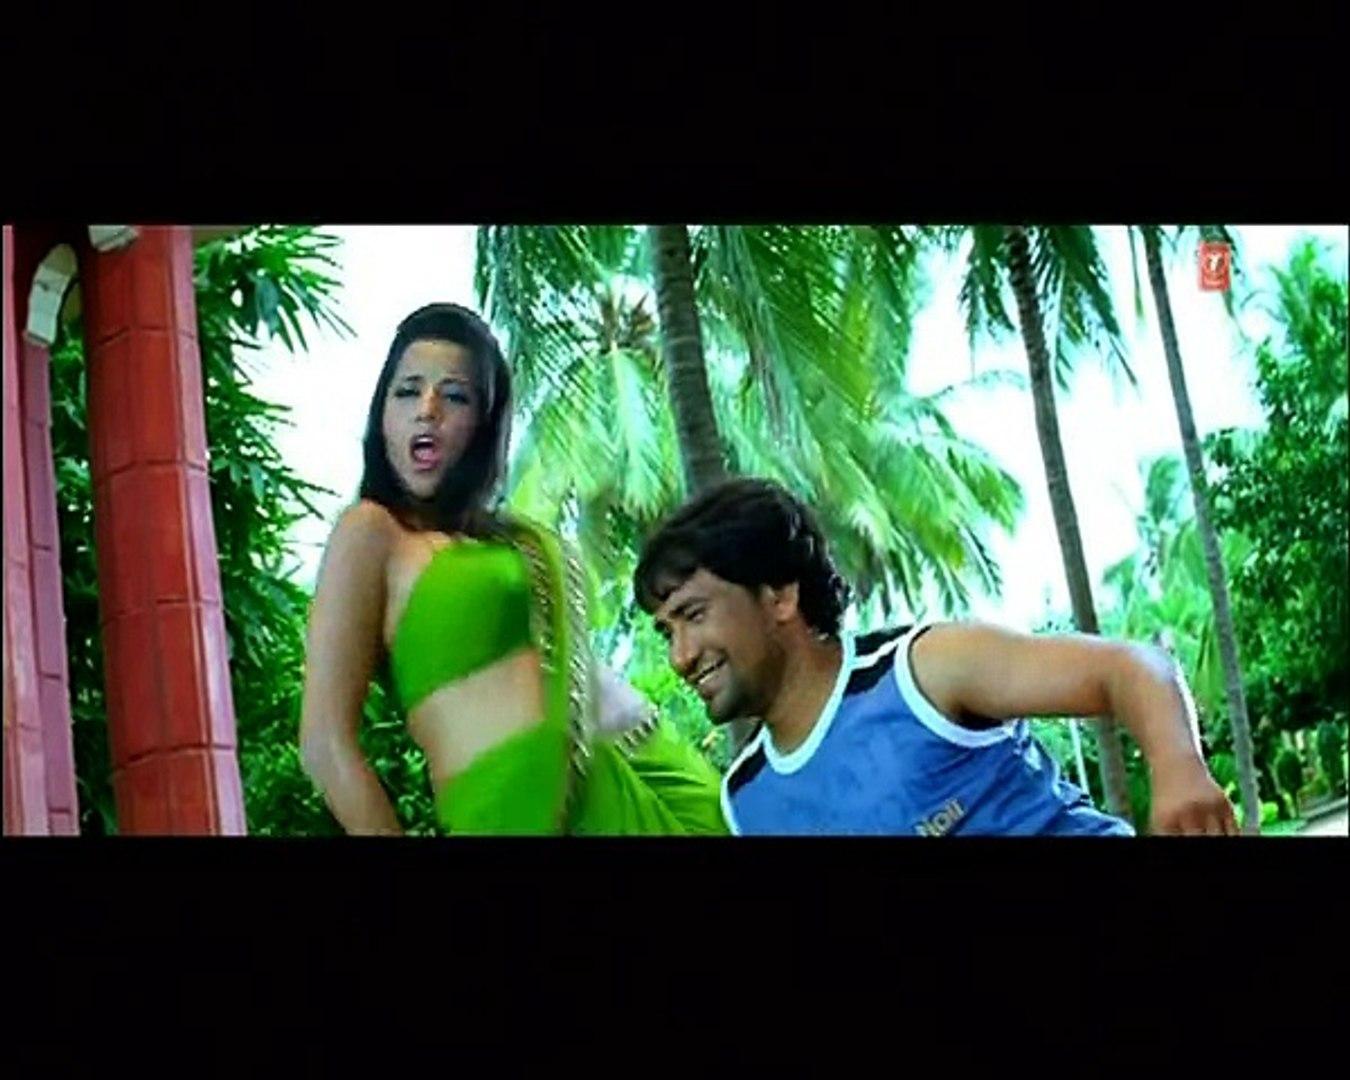 Hot song -Ye Ho Piya Garva Lagaav Na (Bhojpuri Hot Video Song) Ft. Nirahua  Sexy Monalisa